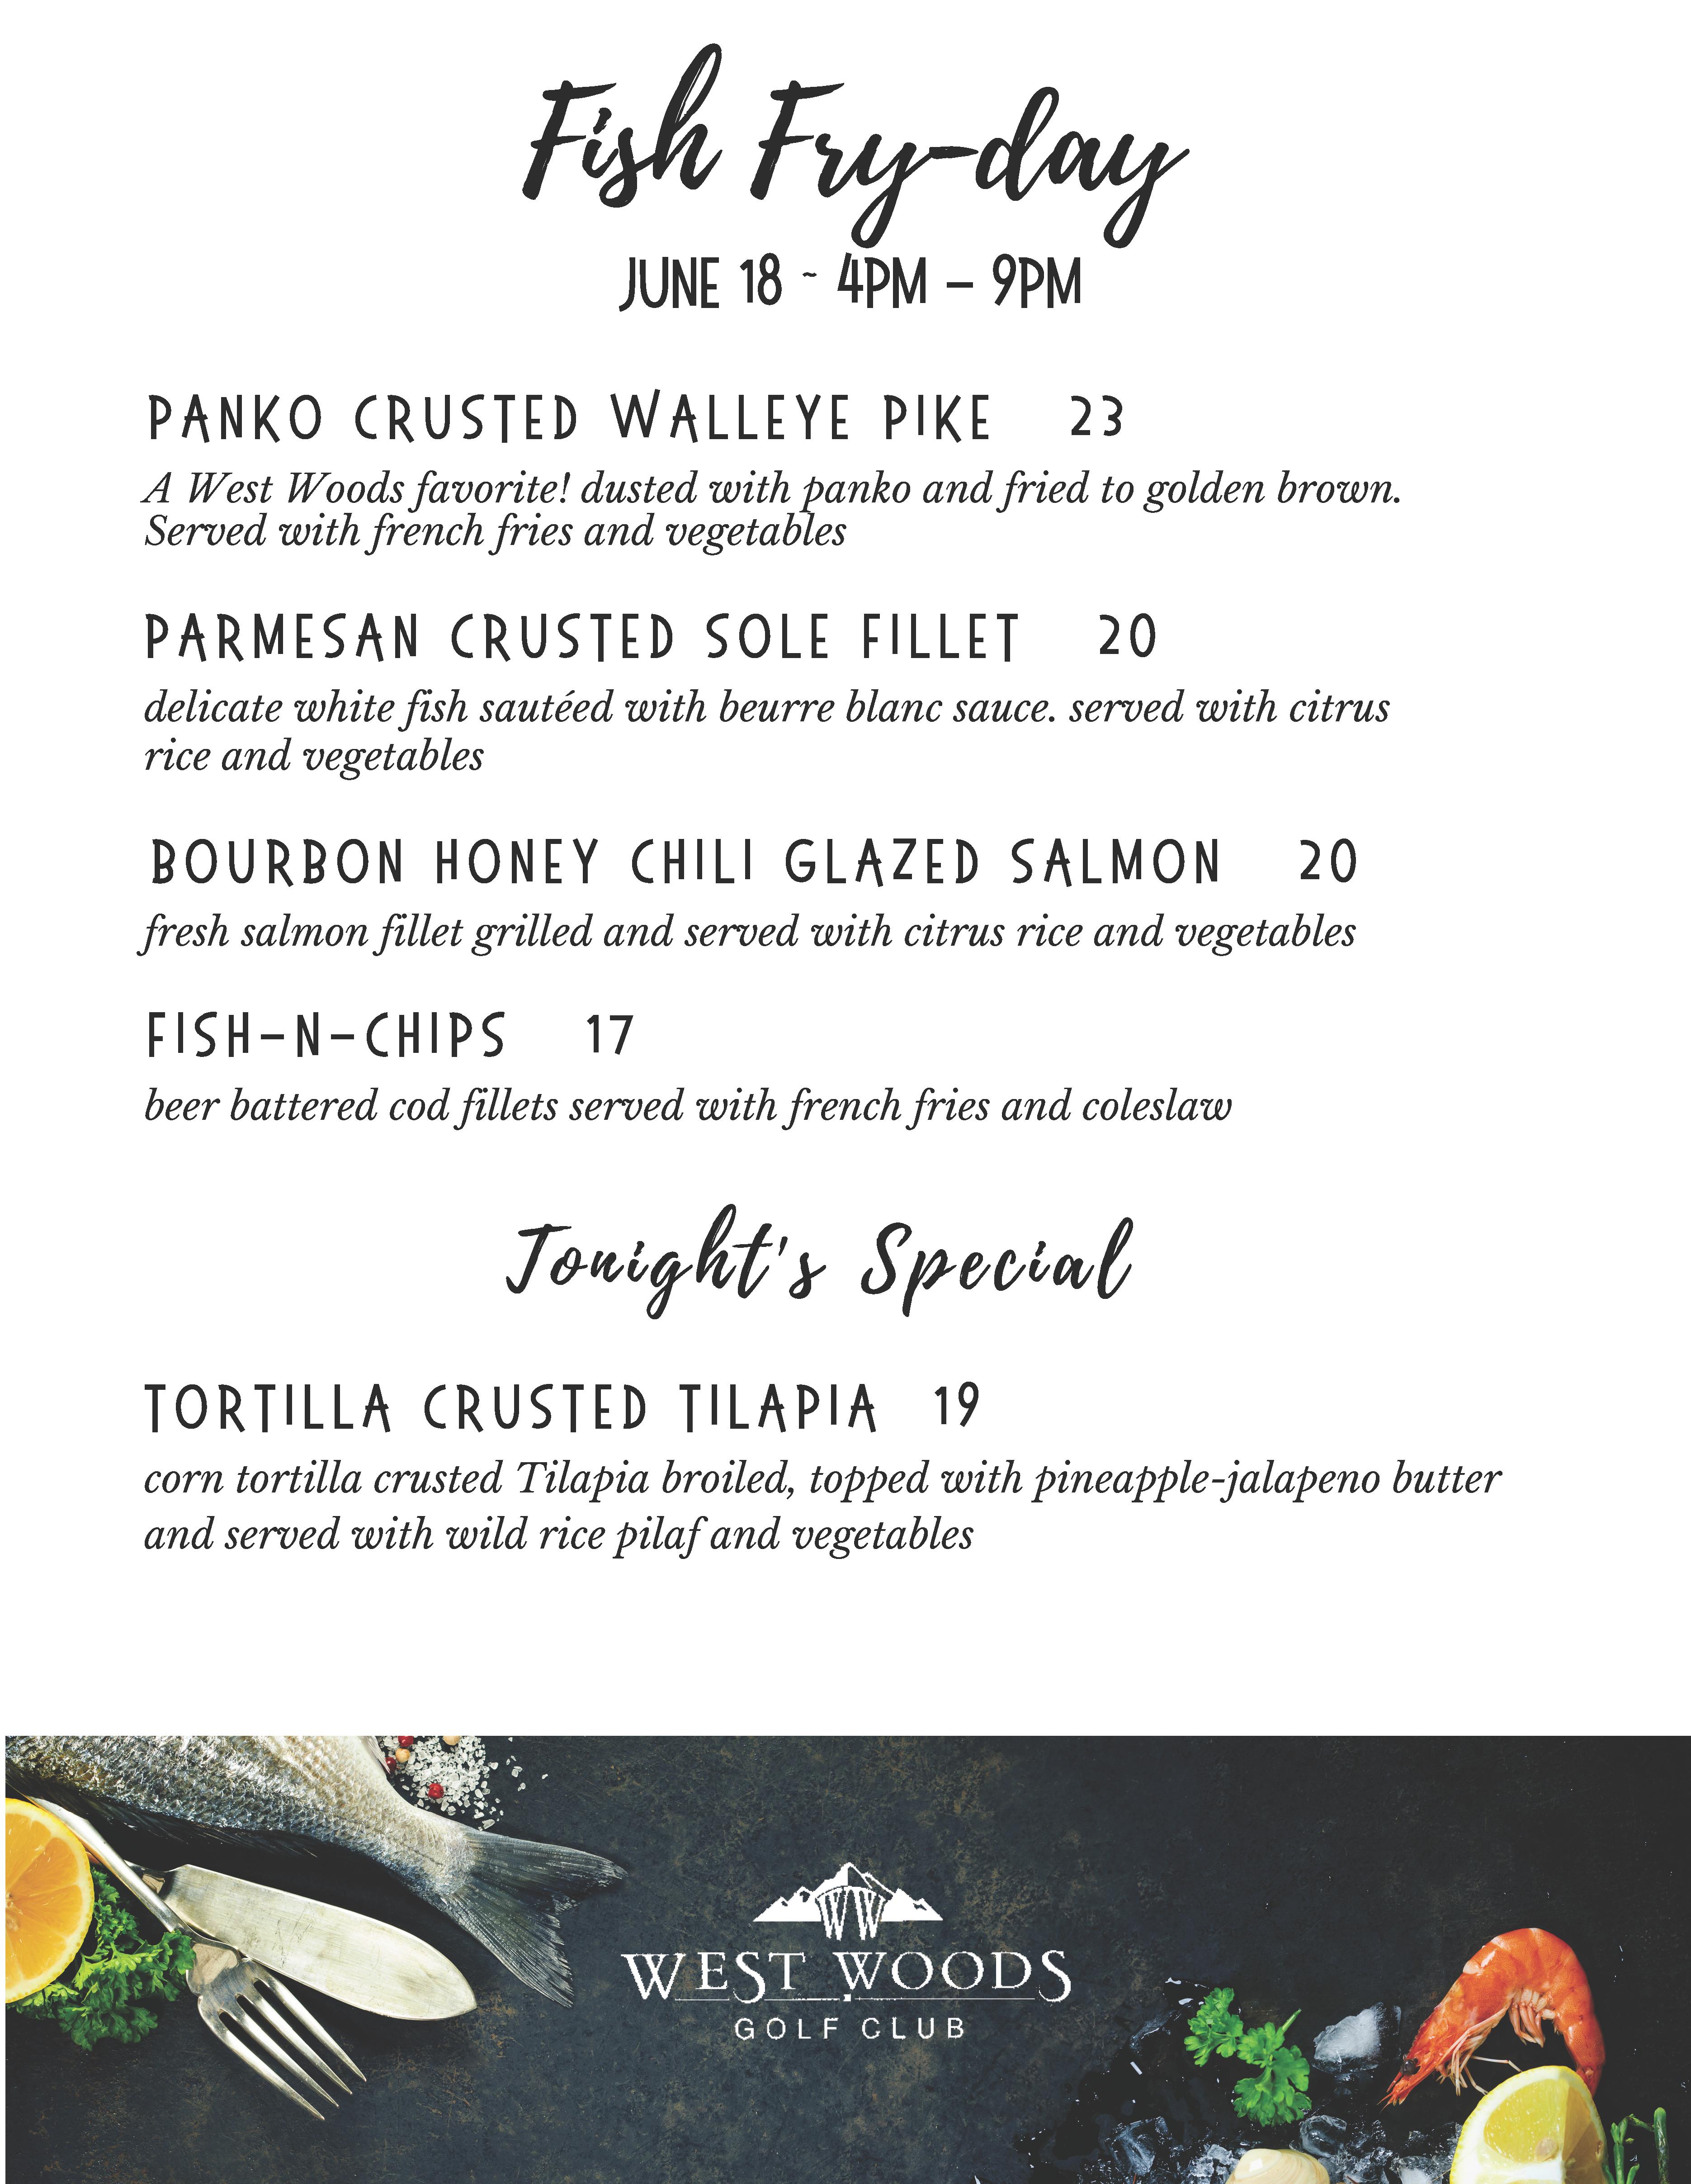 06.18 Fish Fry day menu